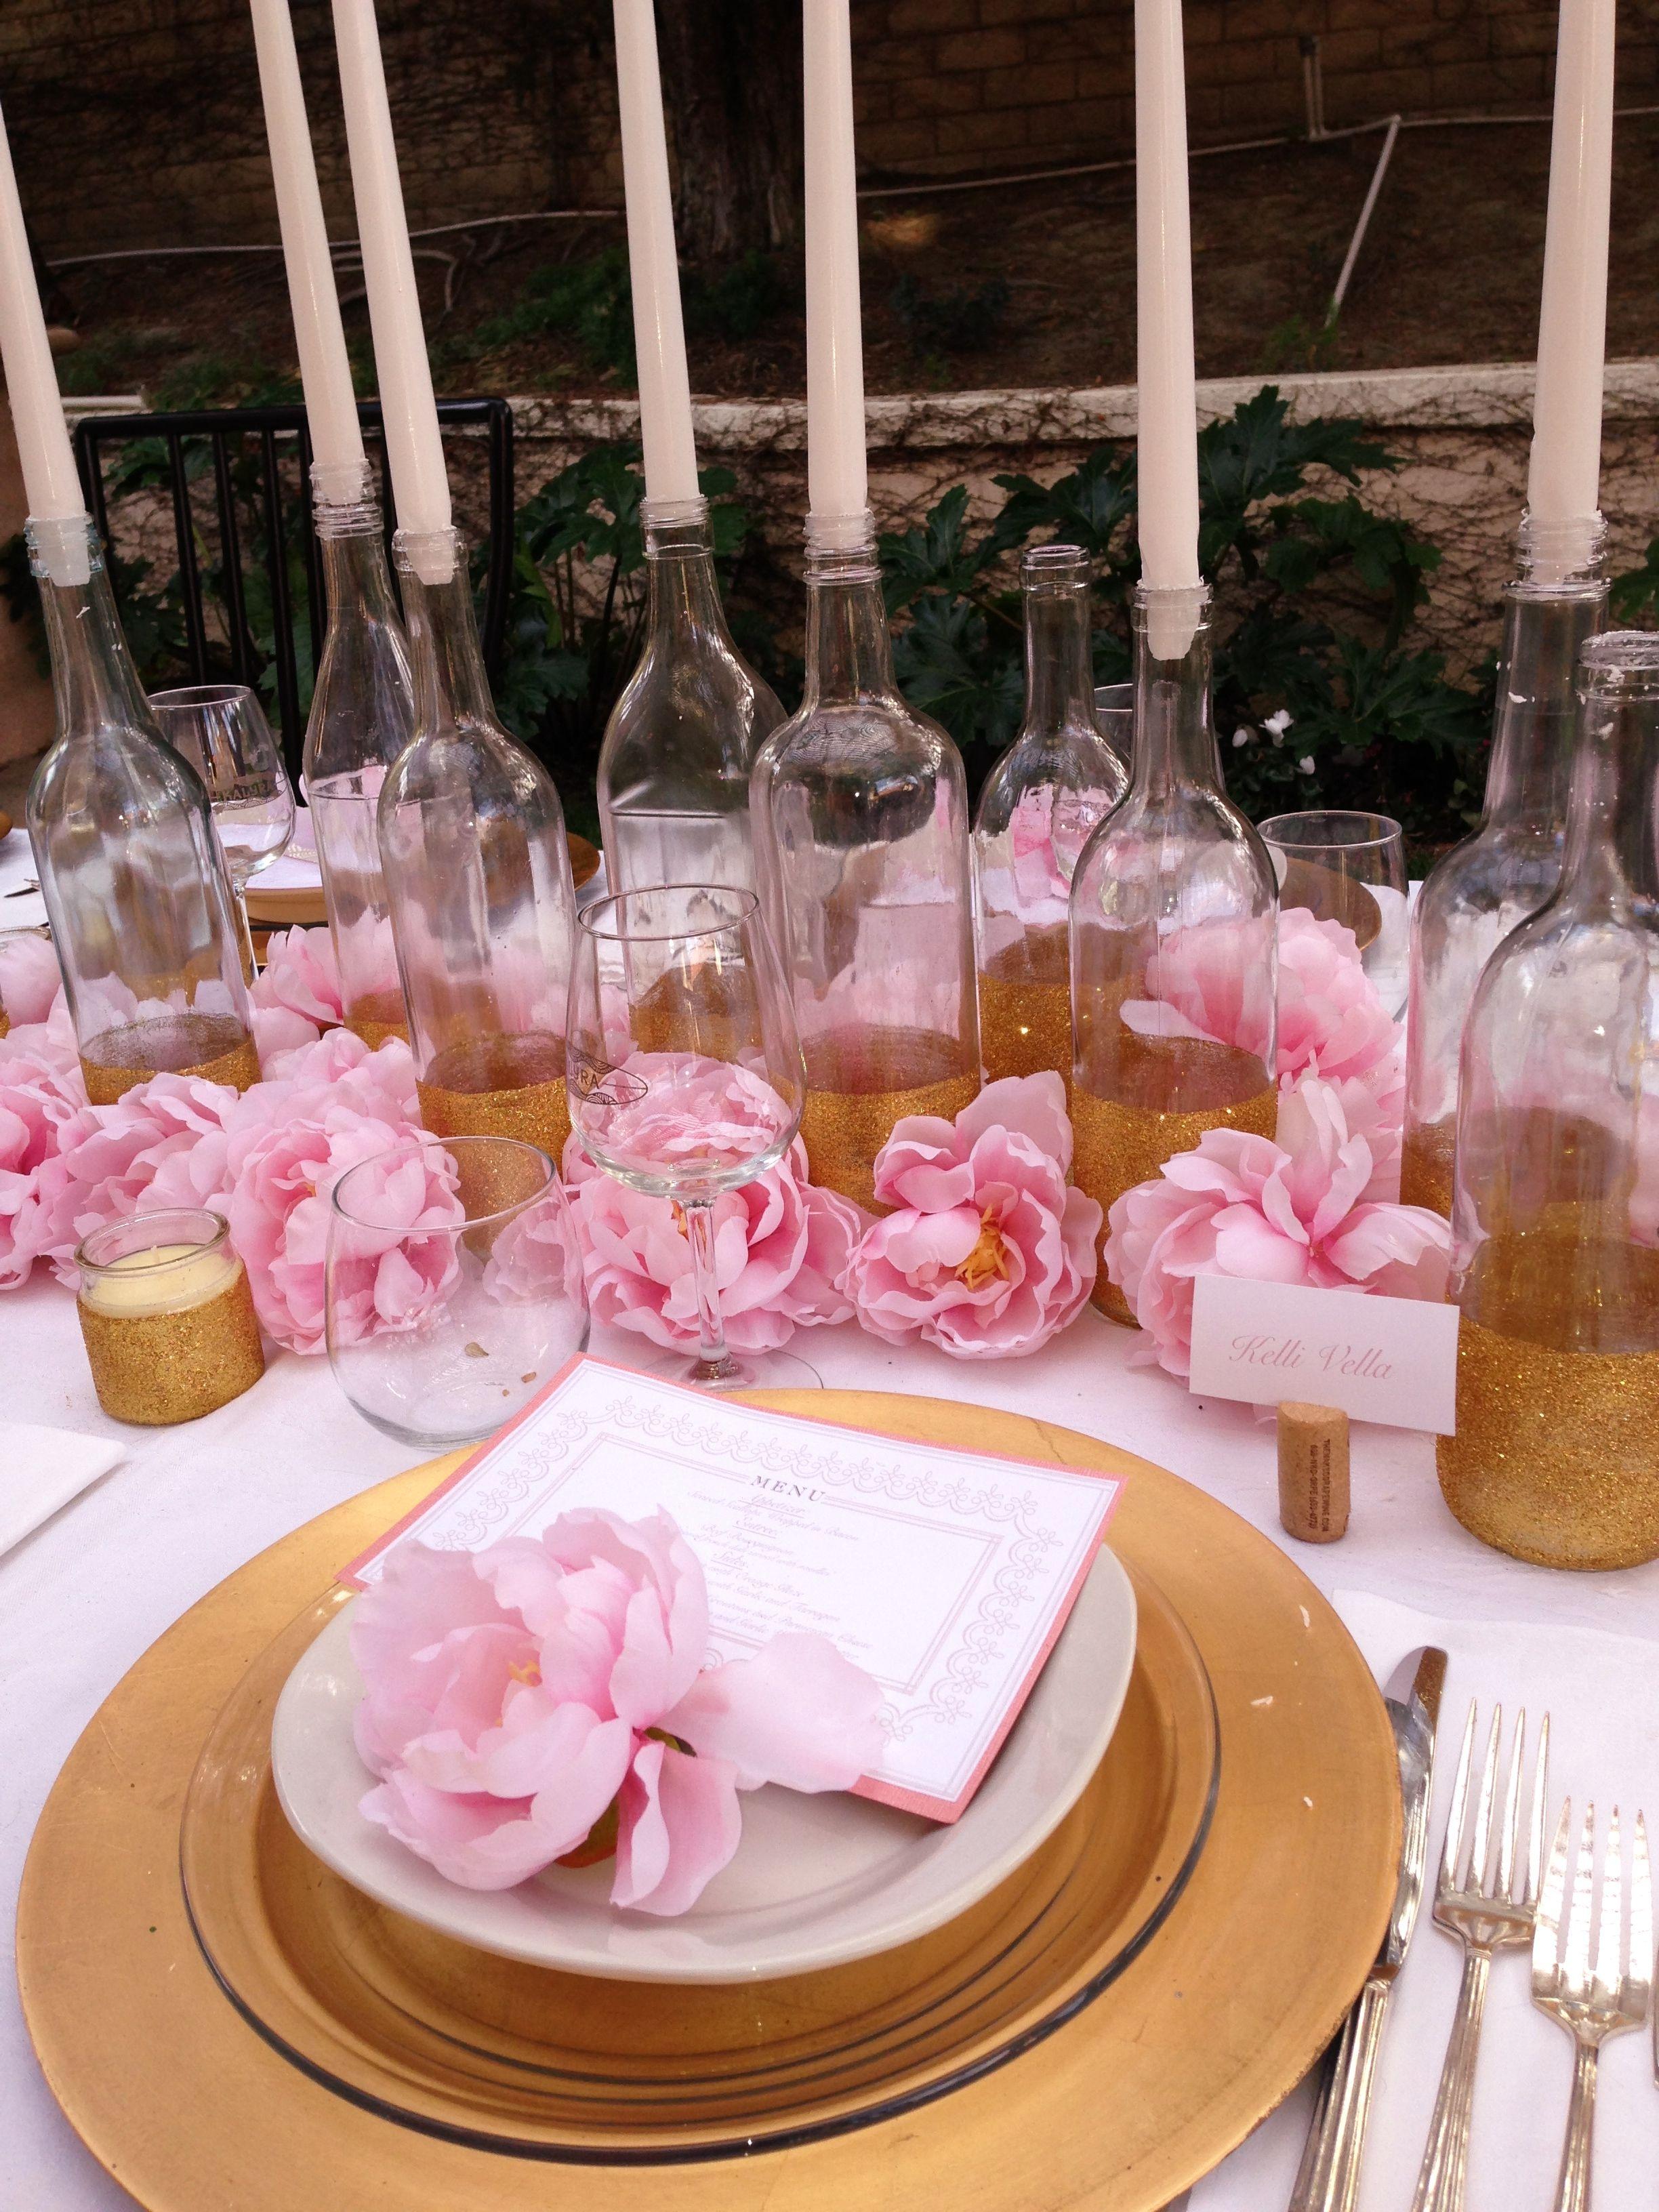 Attractive Birthday Dinner Party Ideas Part - 6: Birthday Dinner Party